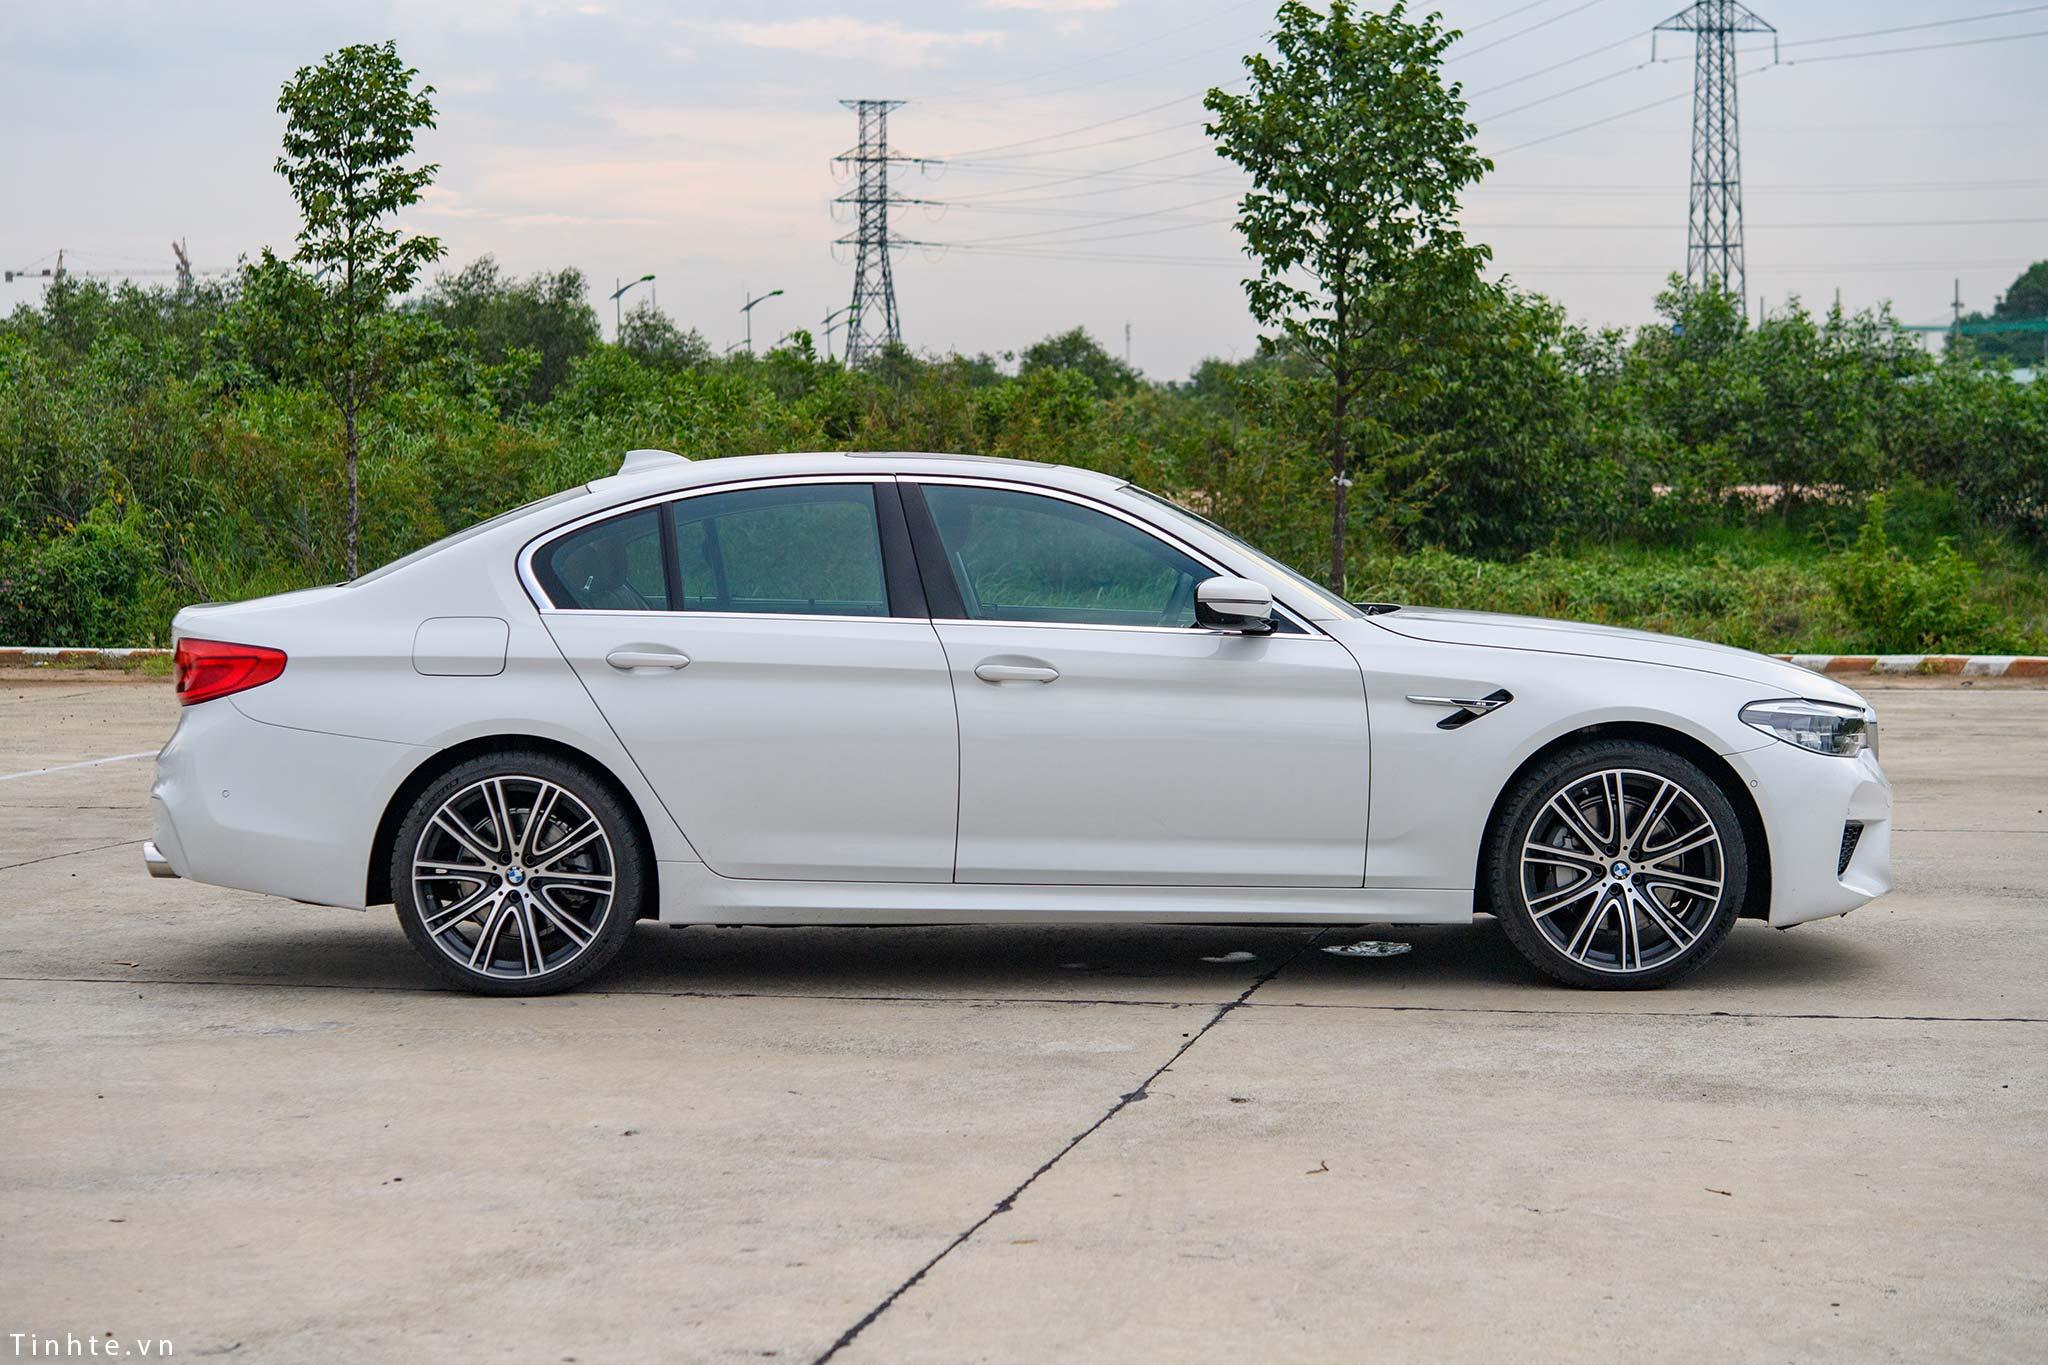 BMW_530i_G30_tinhte_39.jpg